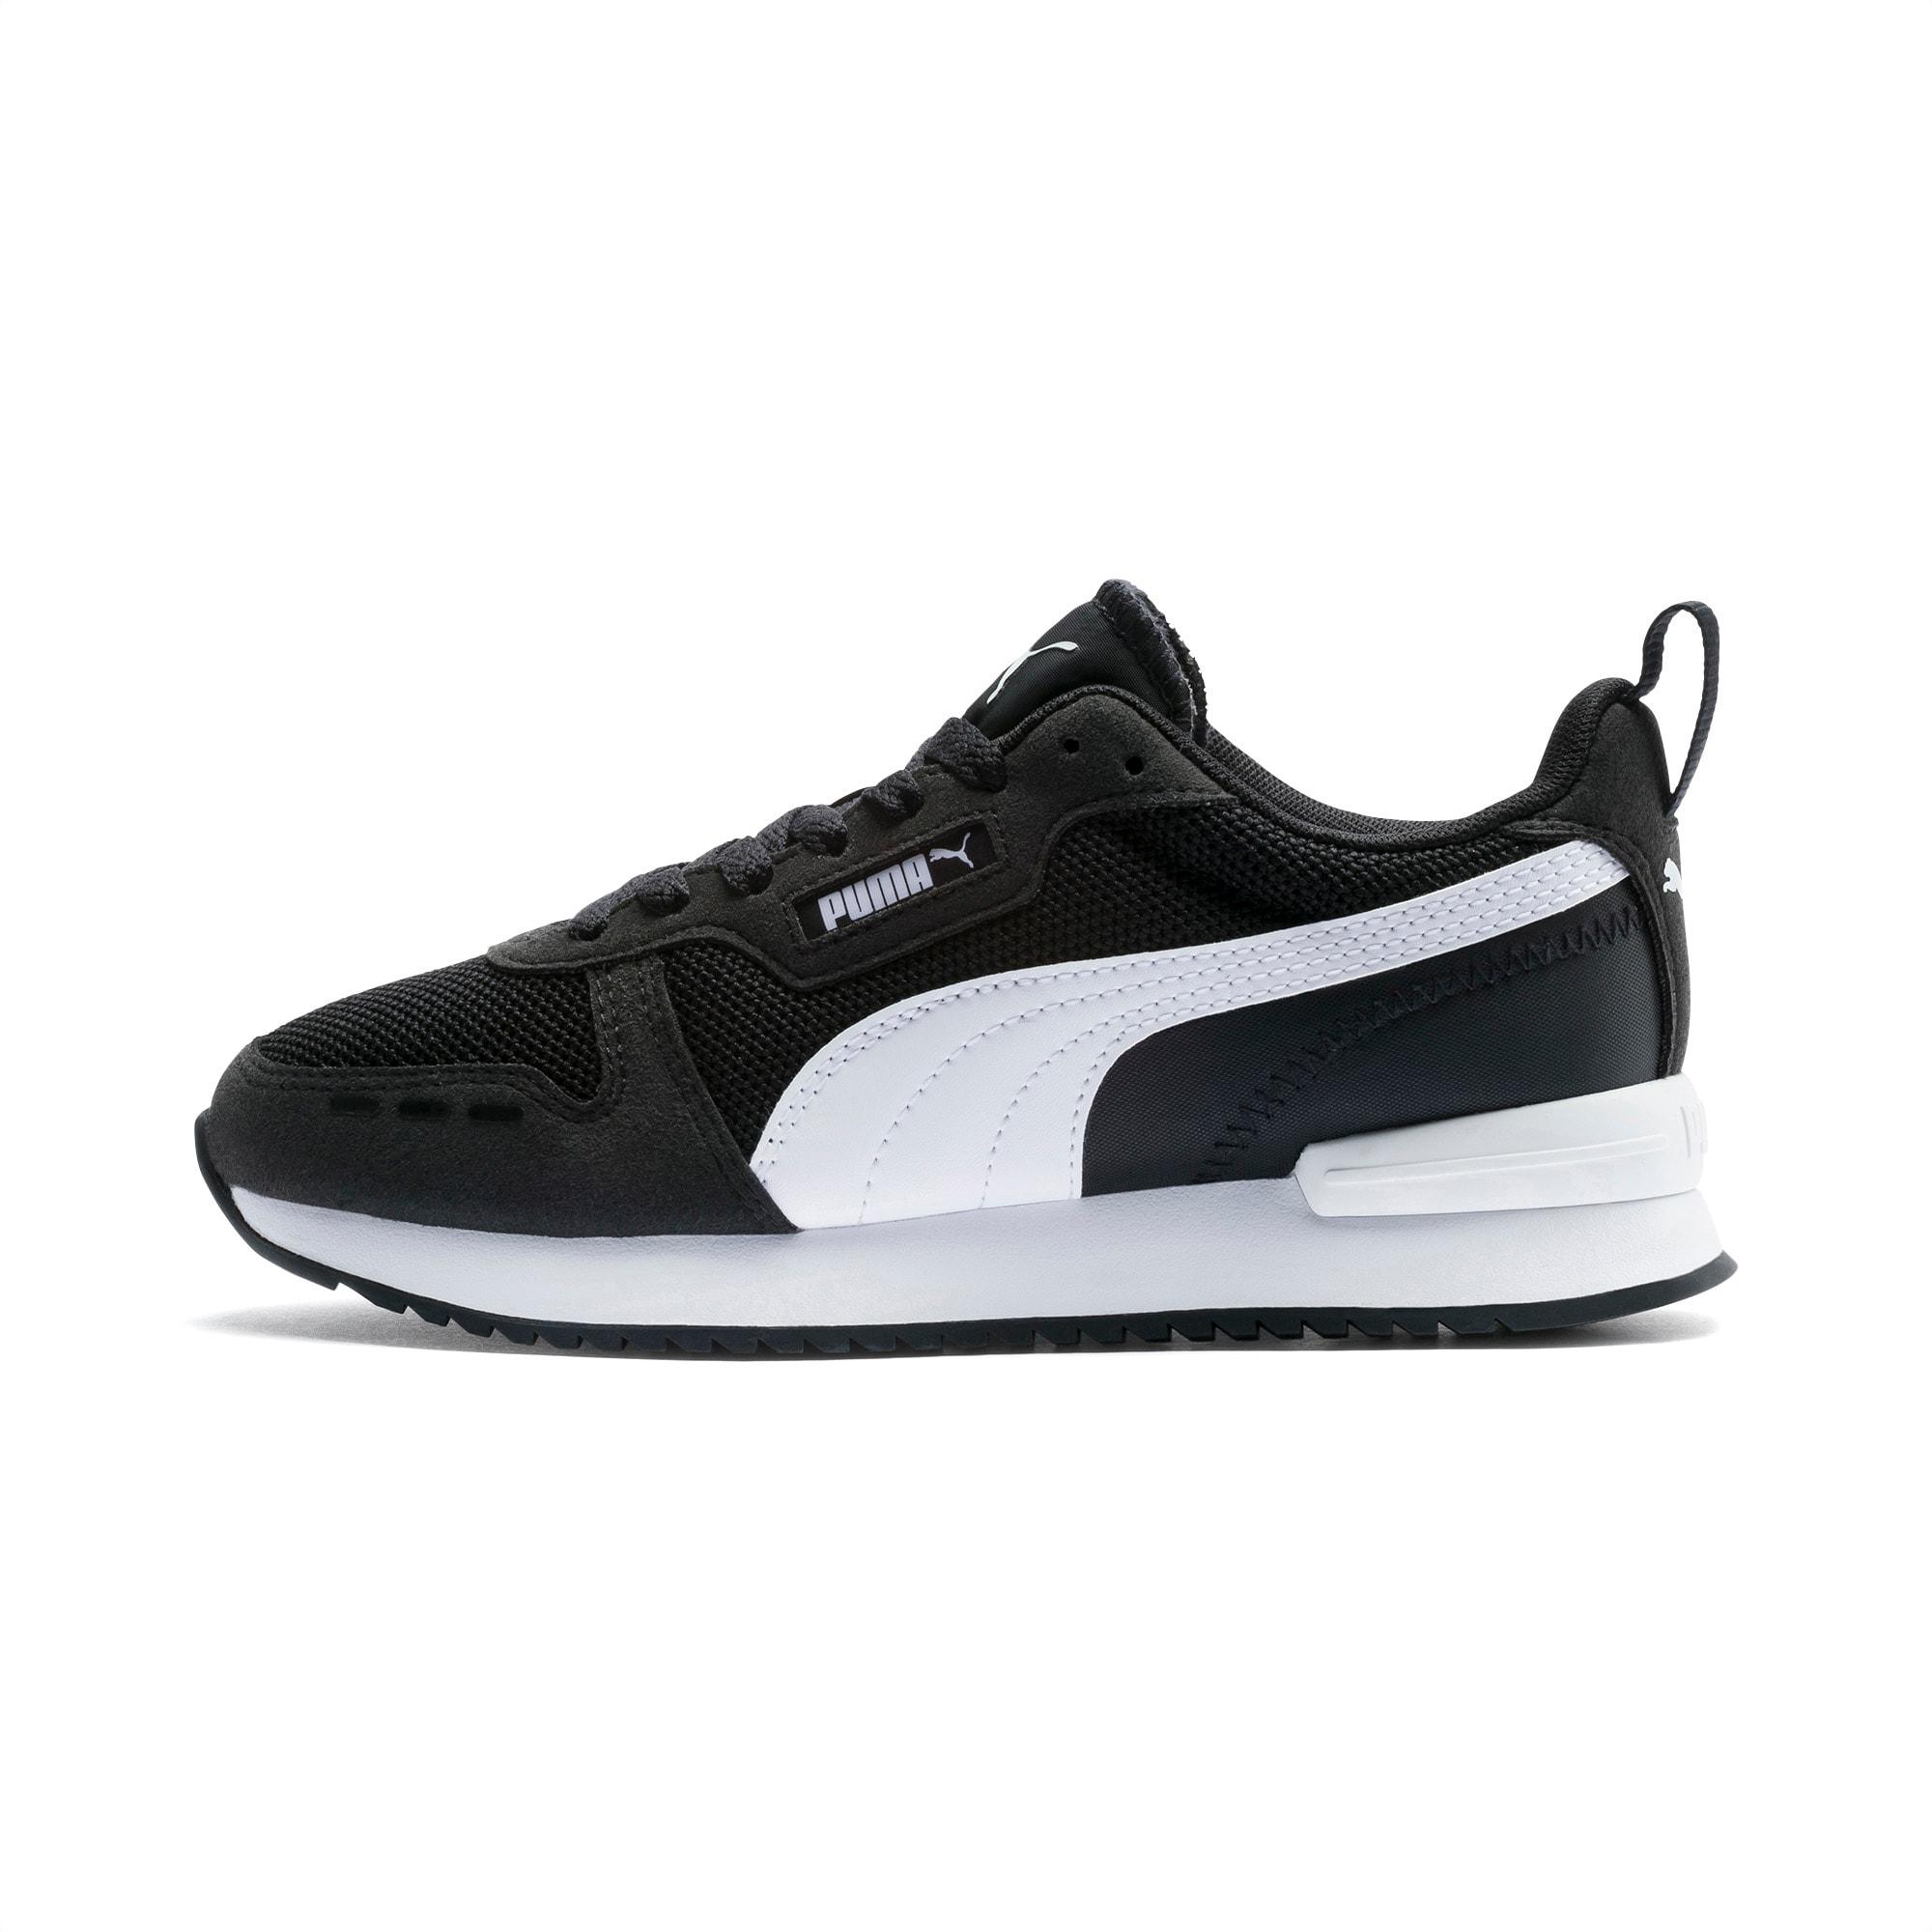 PUMA R78 Sneakers JR